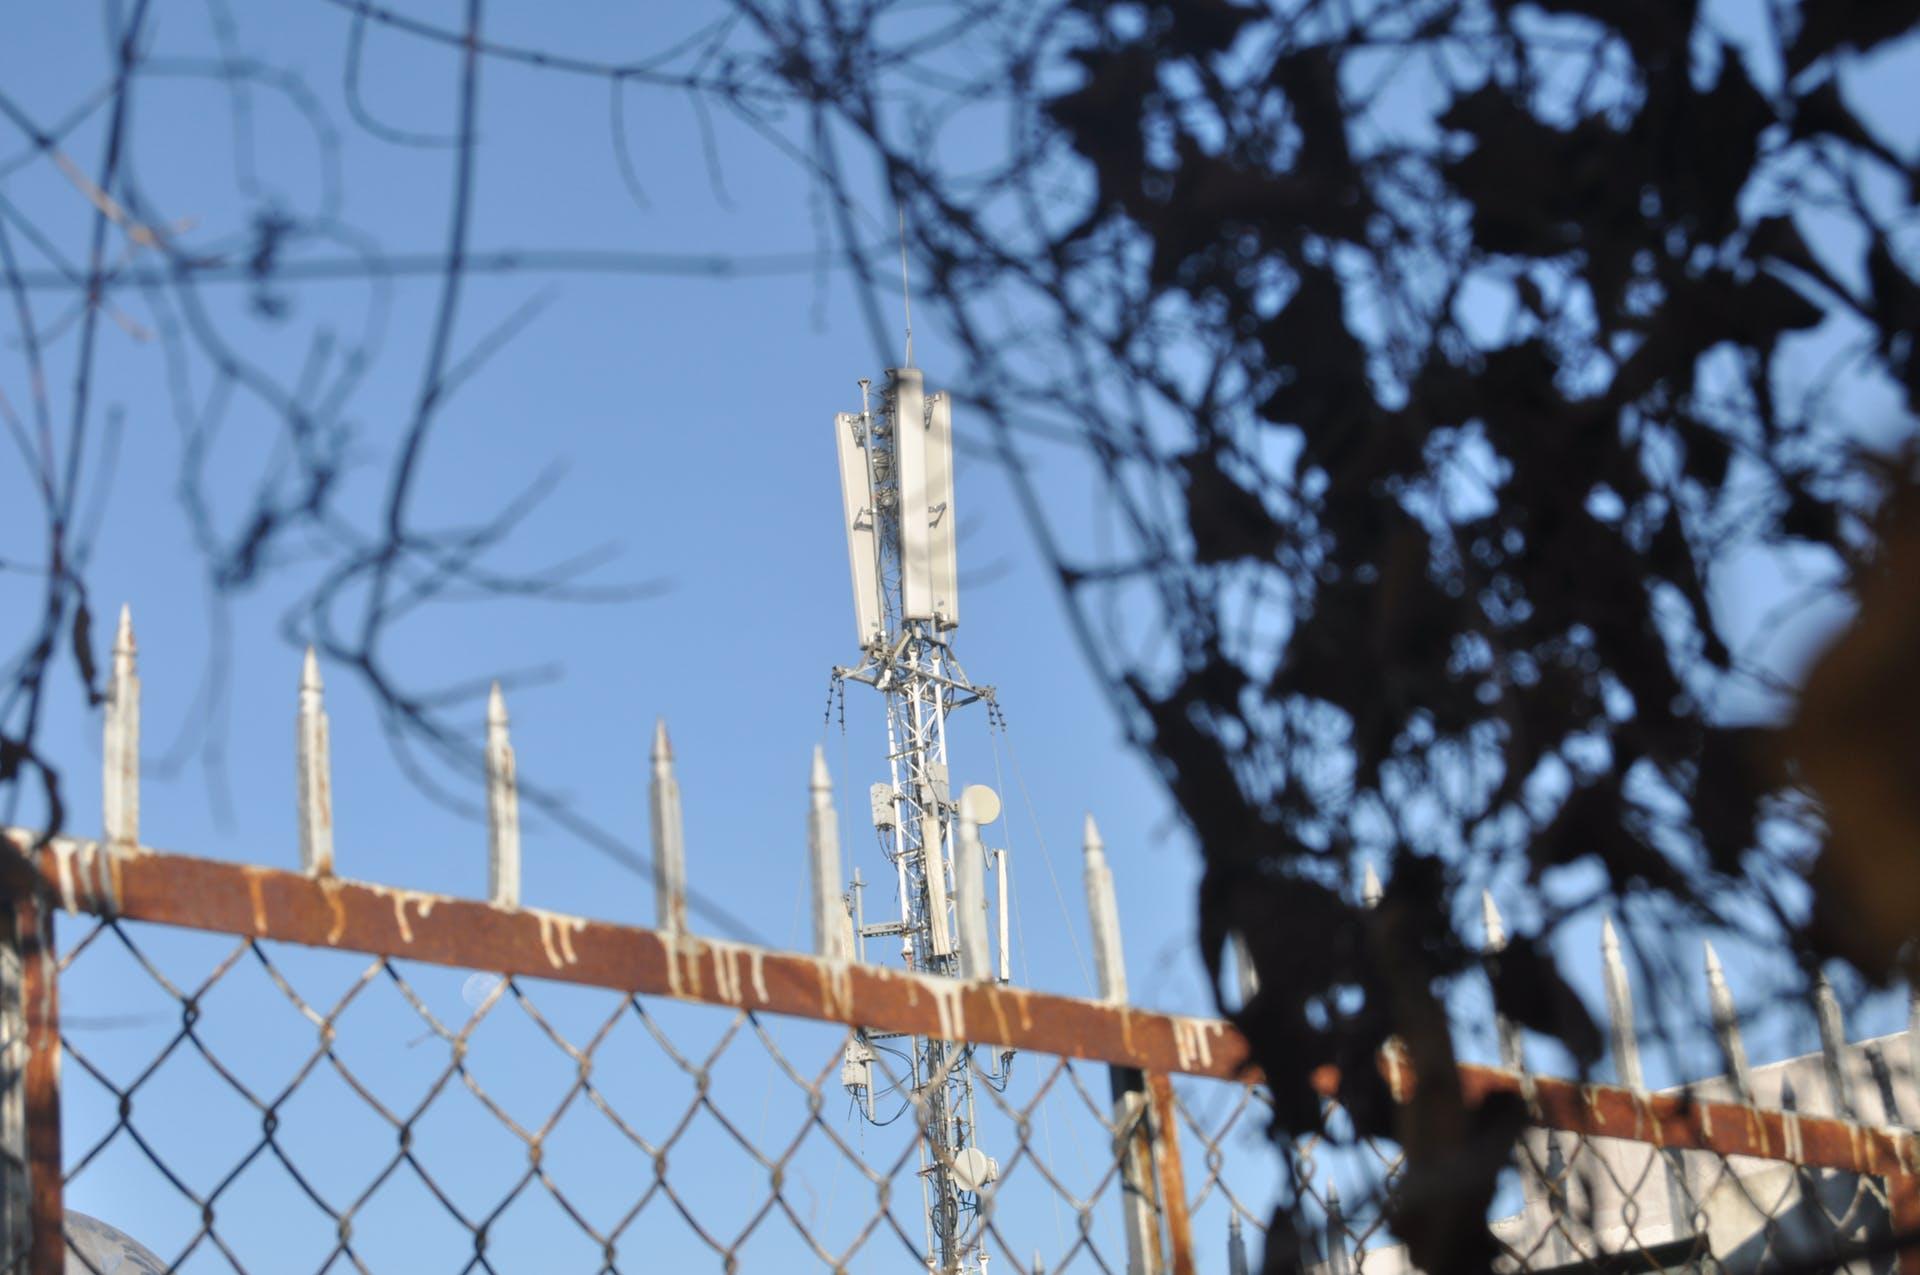 wireless blur outdoor mobile pattern depth of field blue background telephone pole fence pole